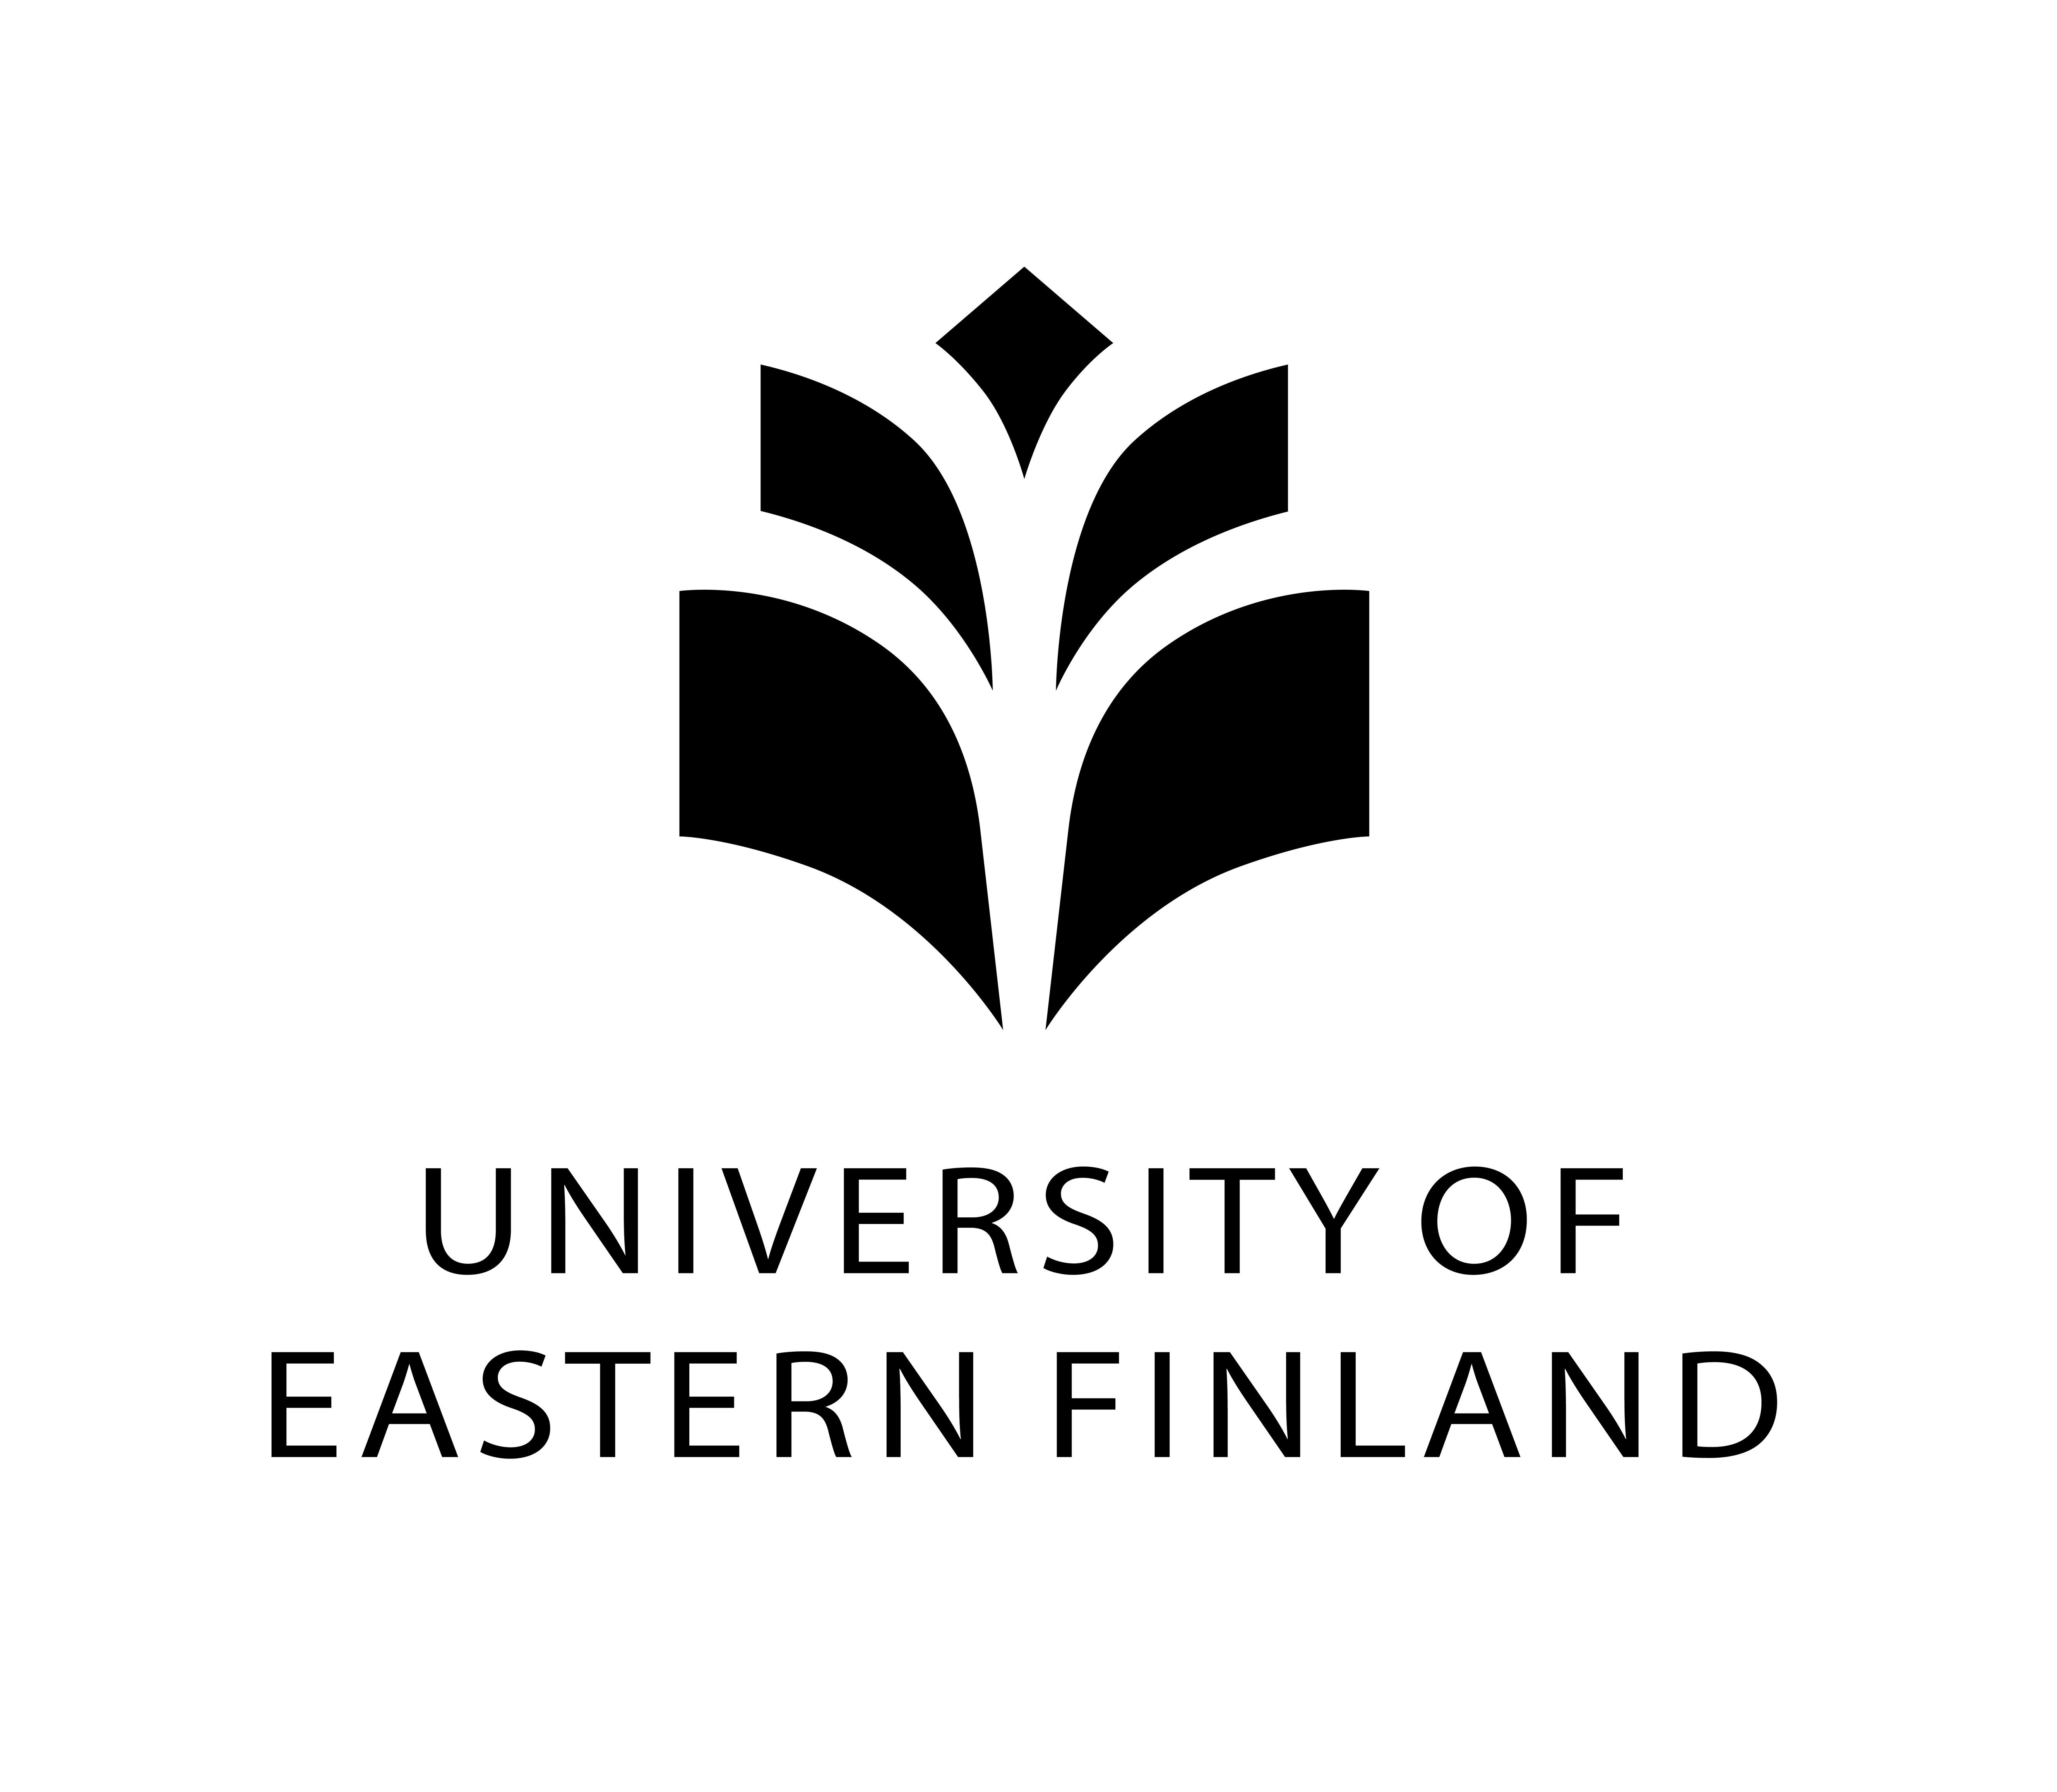 Rahoittajalogo https://www.uef.fi